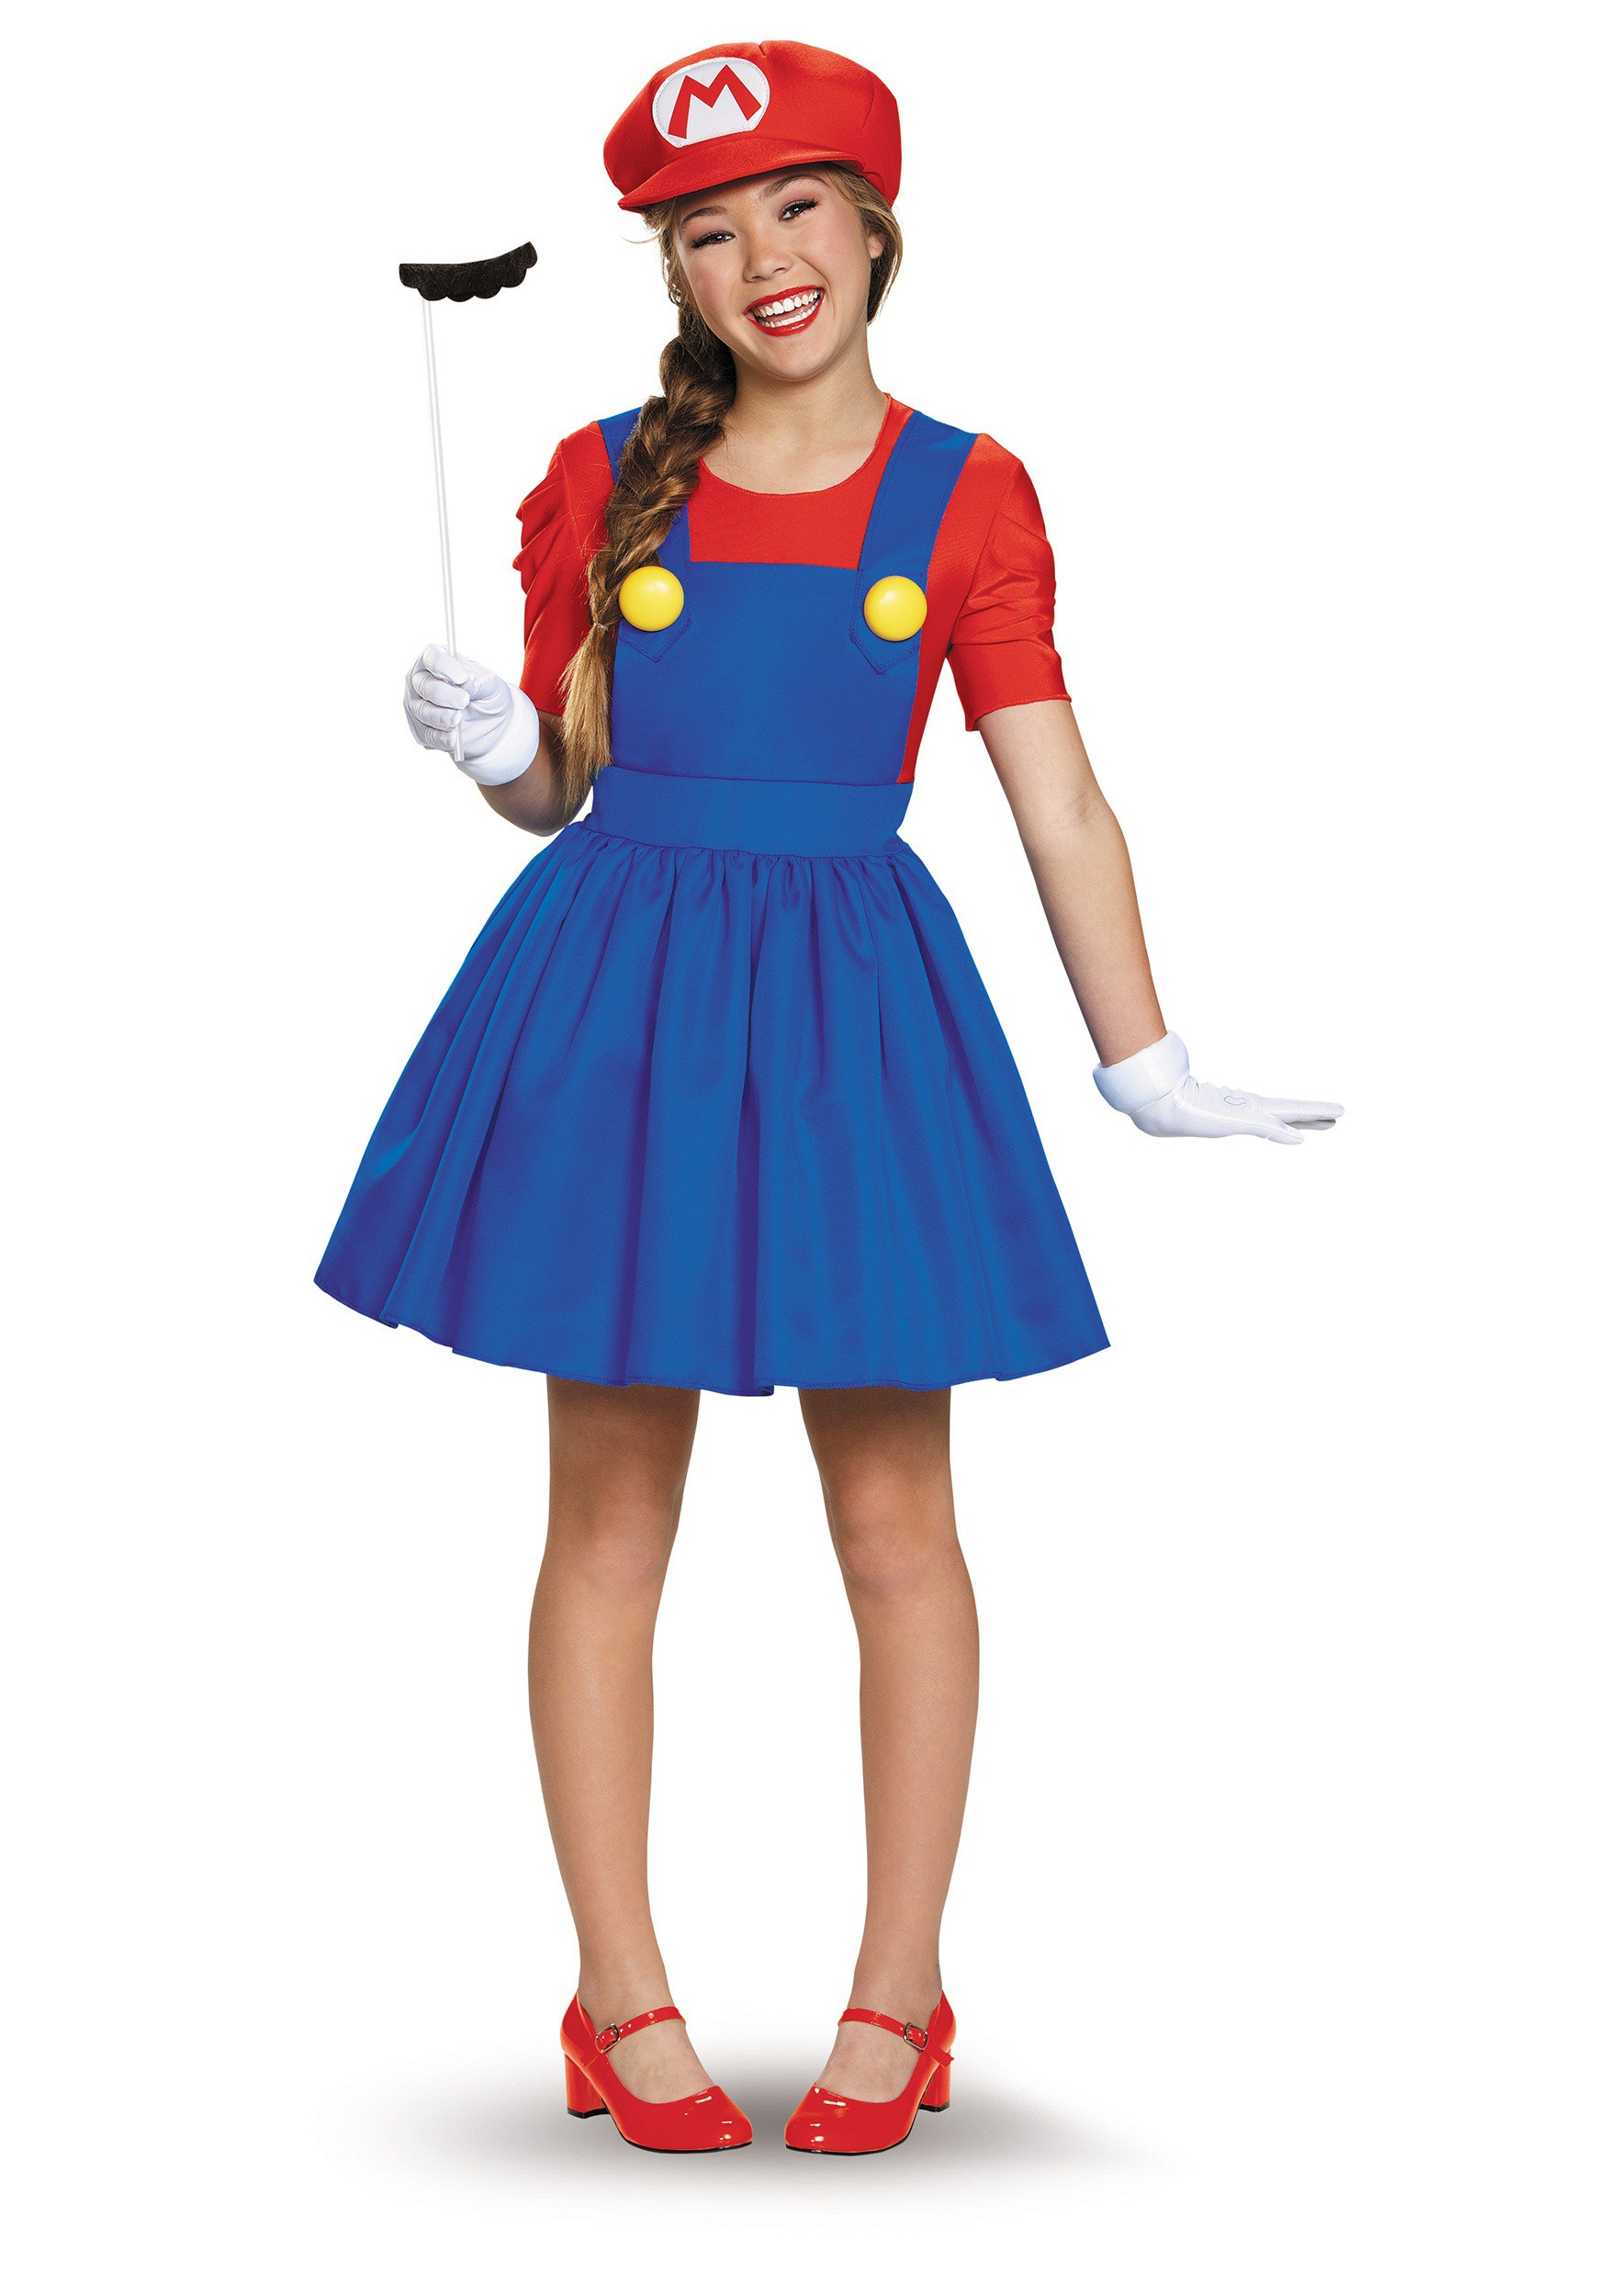 Halloween Costumes for Teens & Tweens HalloweenCostumes